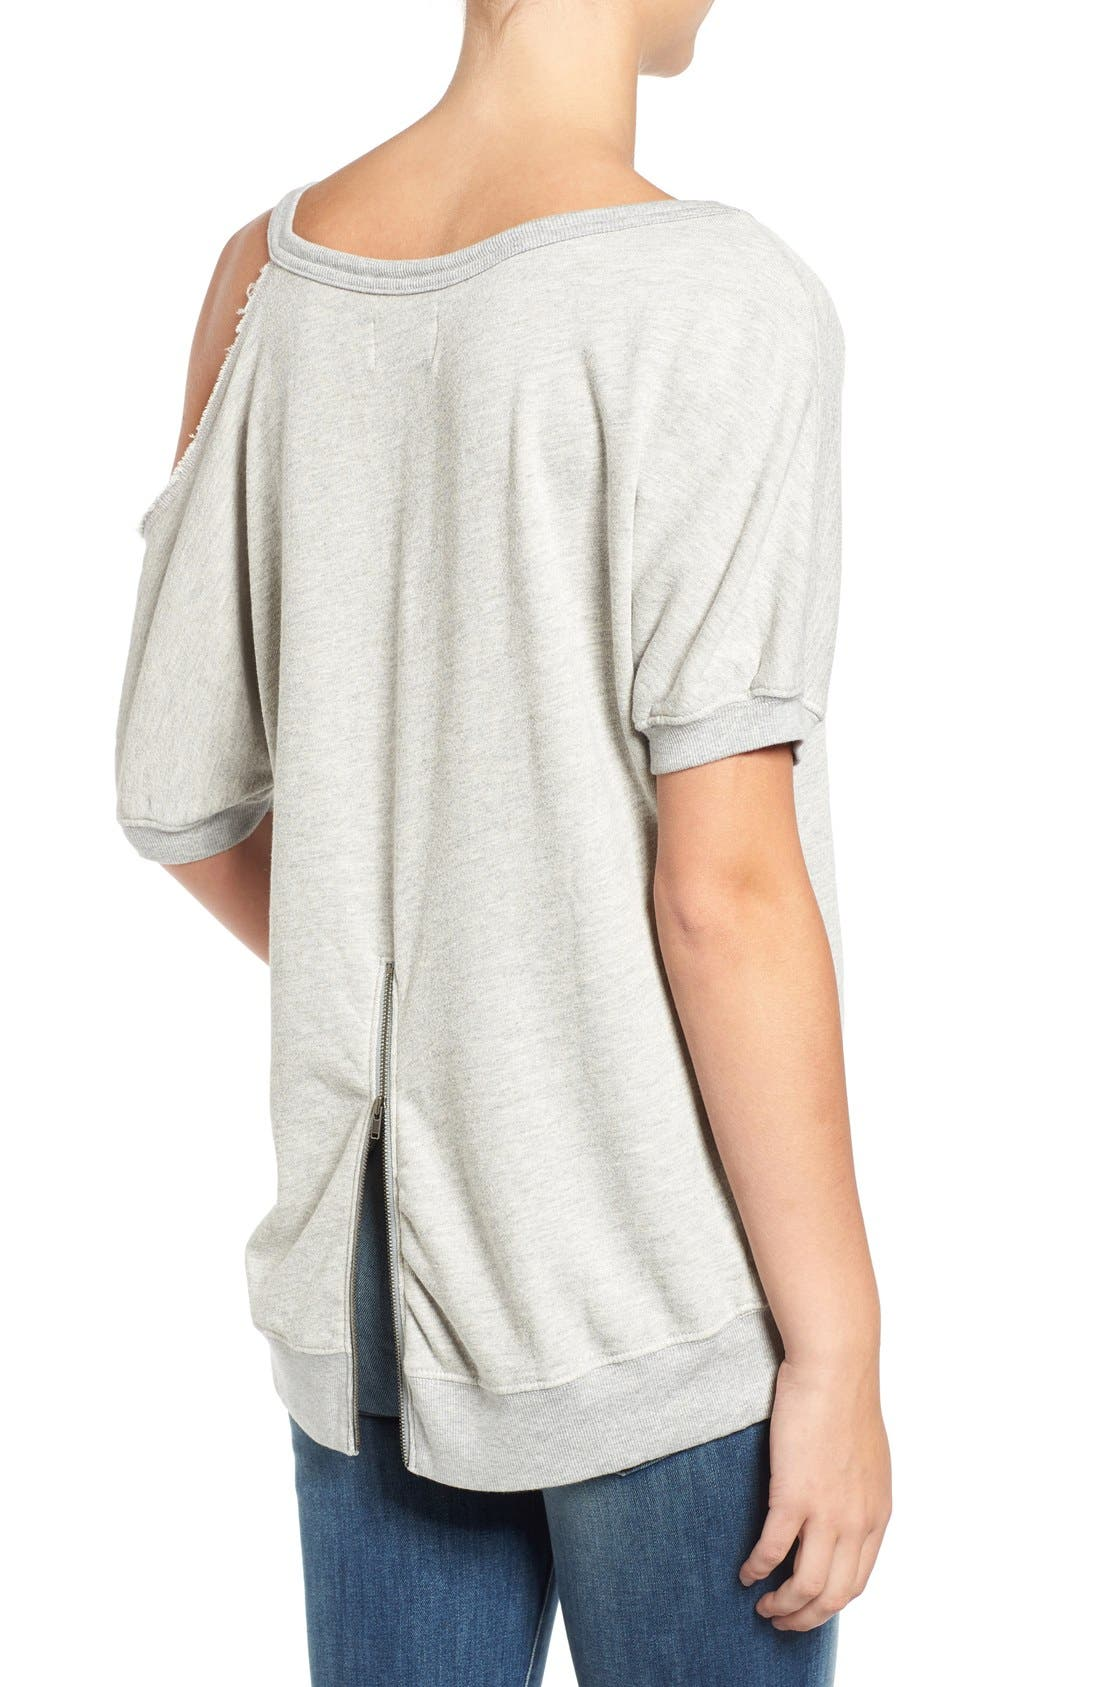 PAM & GELA, Distressed Open Shoulder Sweatshirt, Alternate thumbnail 5, color, 031